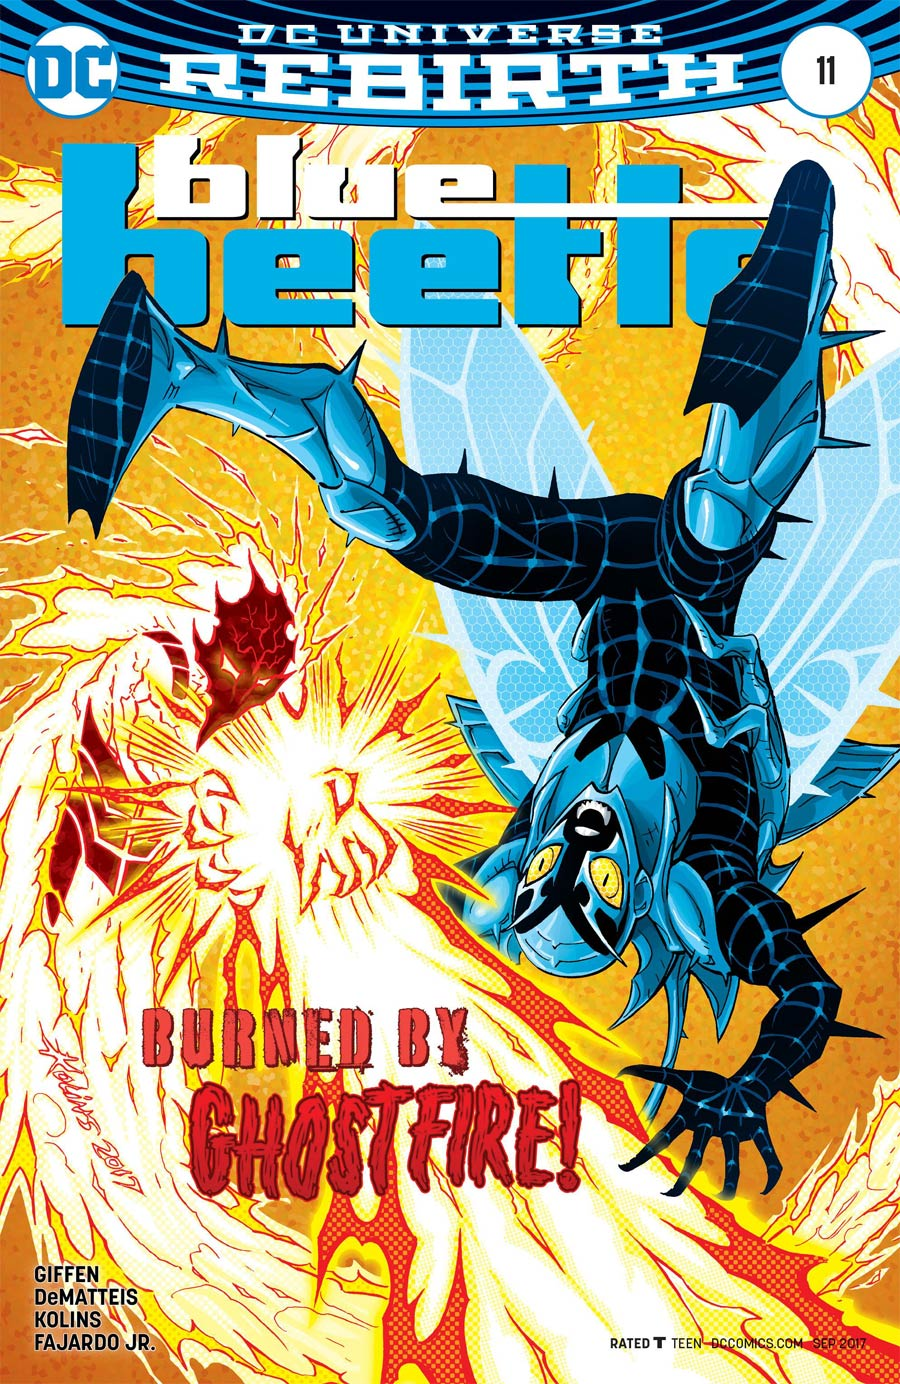 Blue Beetle (DC) Vol 4 #11 Cover A Regular Scott Kolins Cover